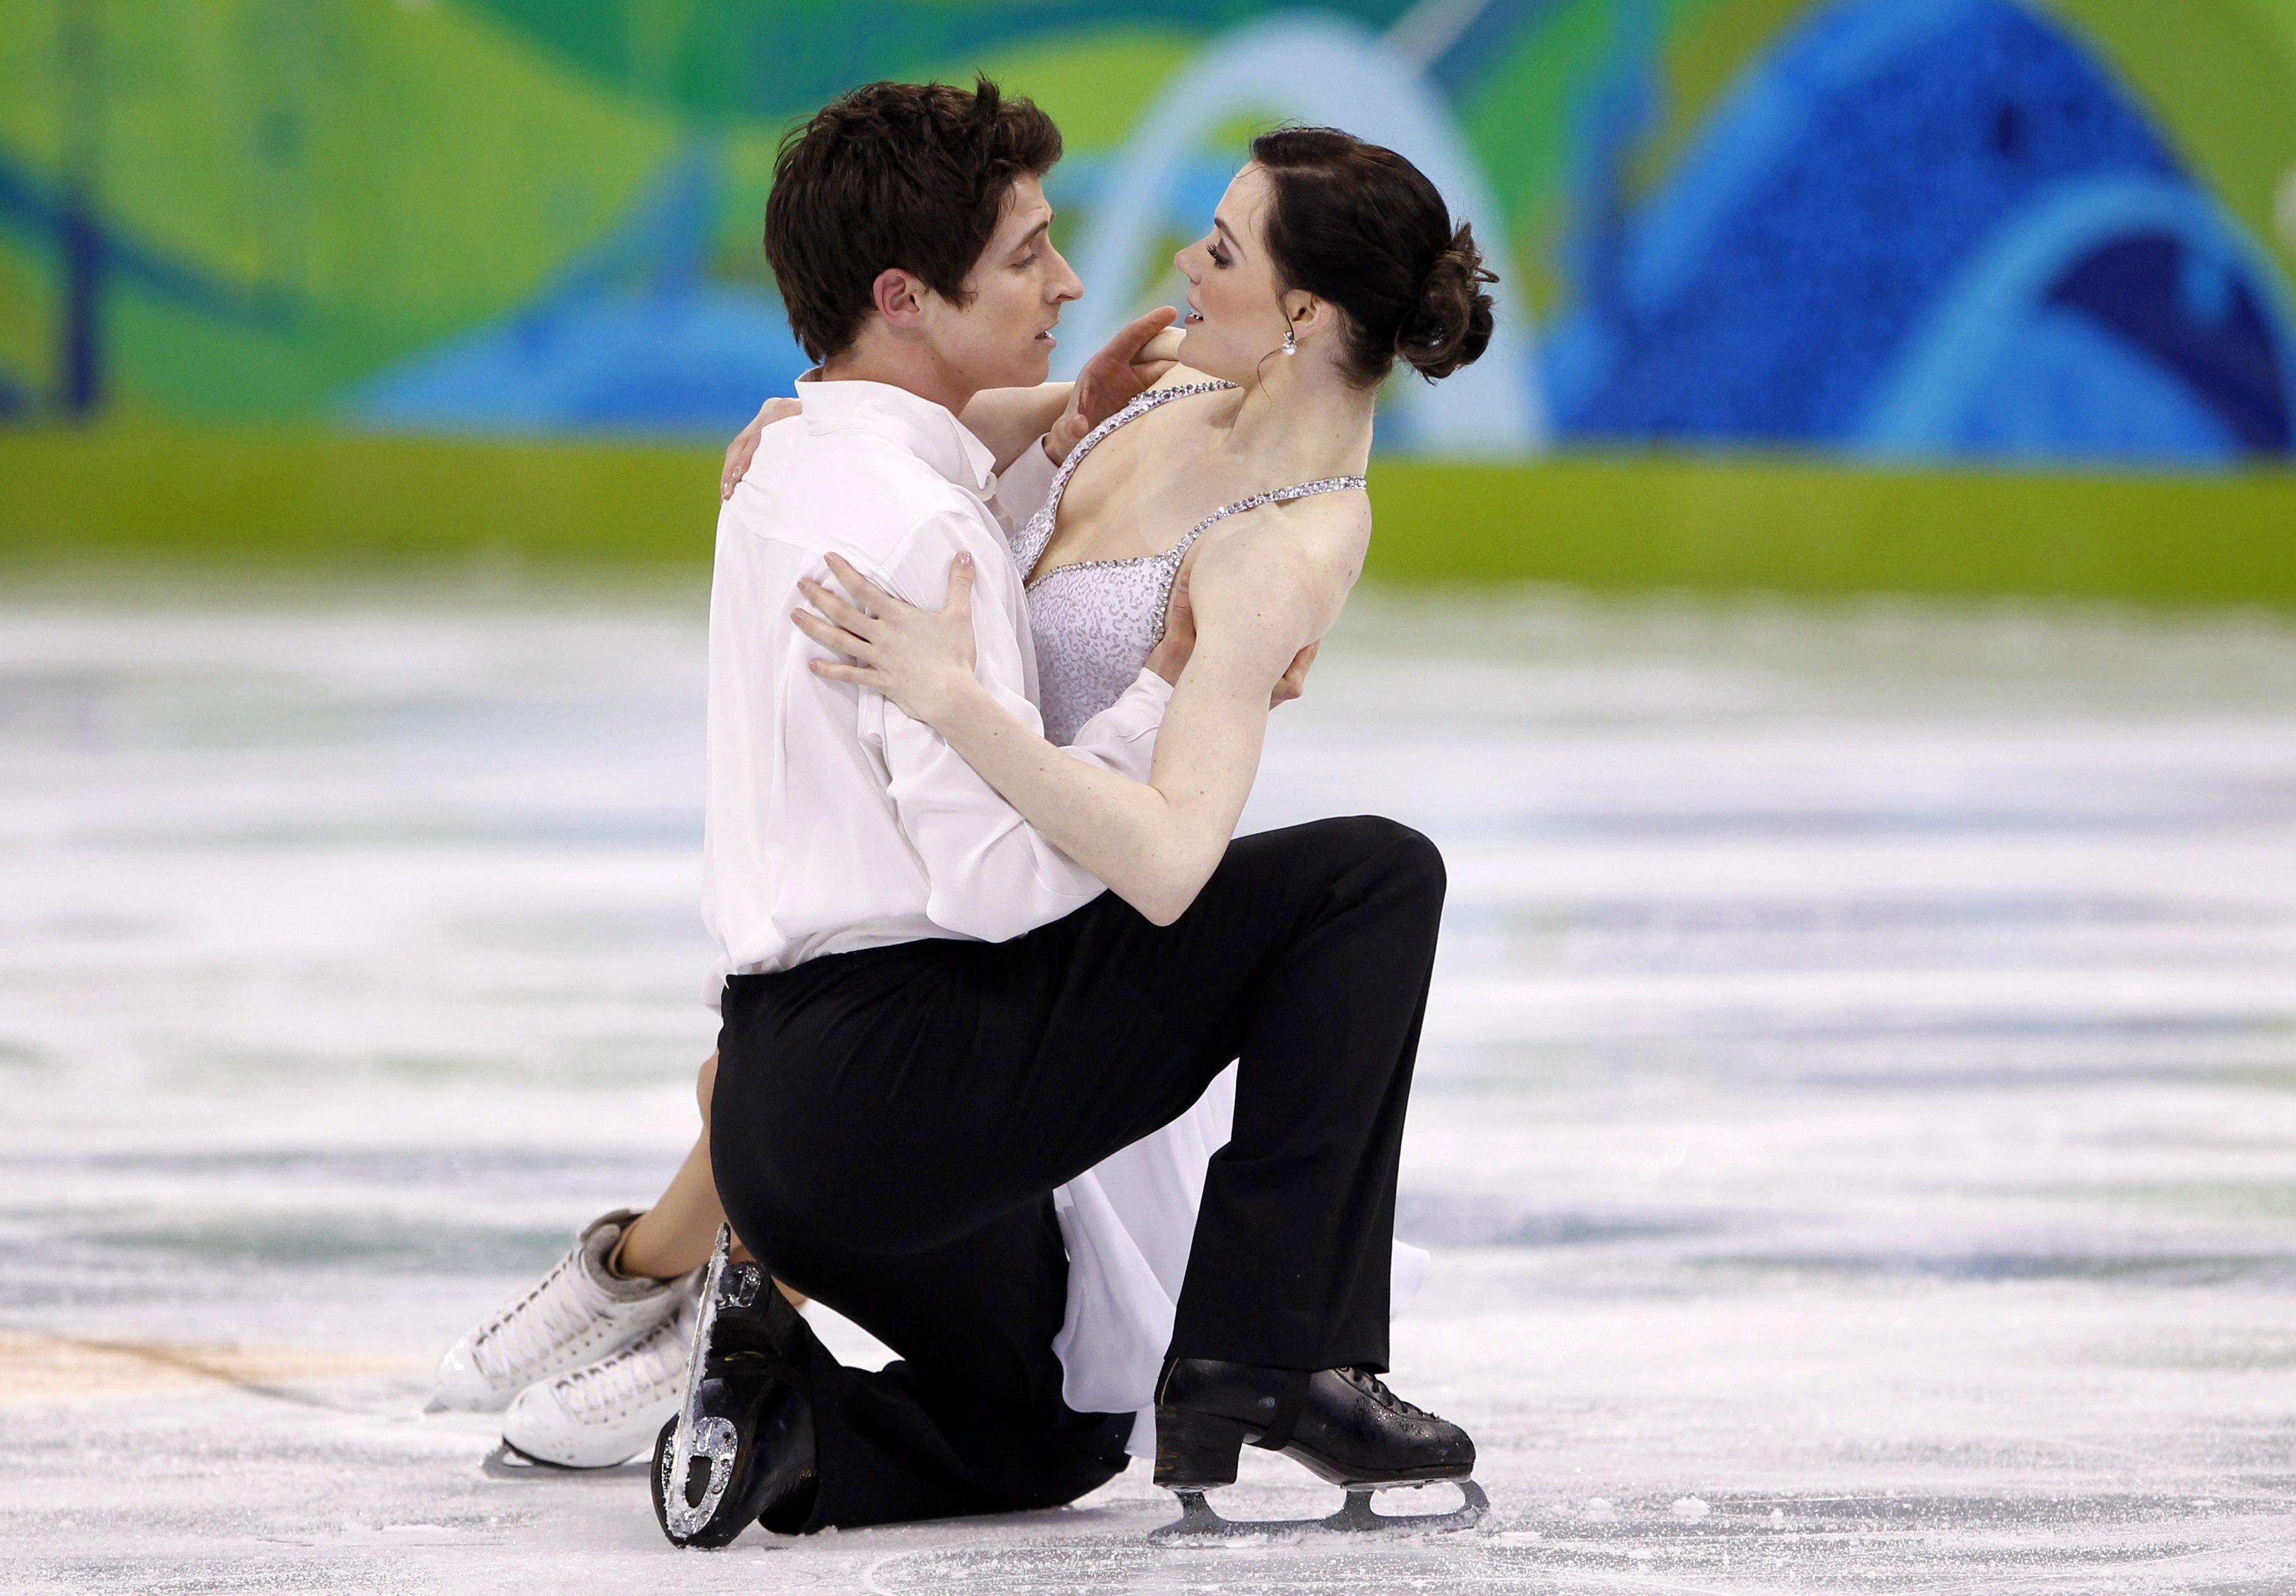 Figure Skating - Pairs